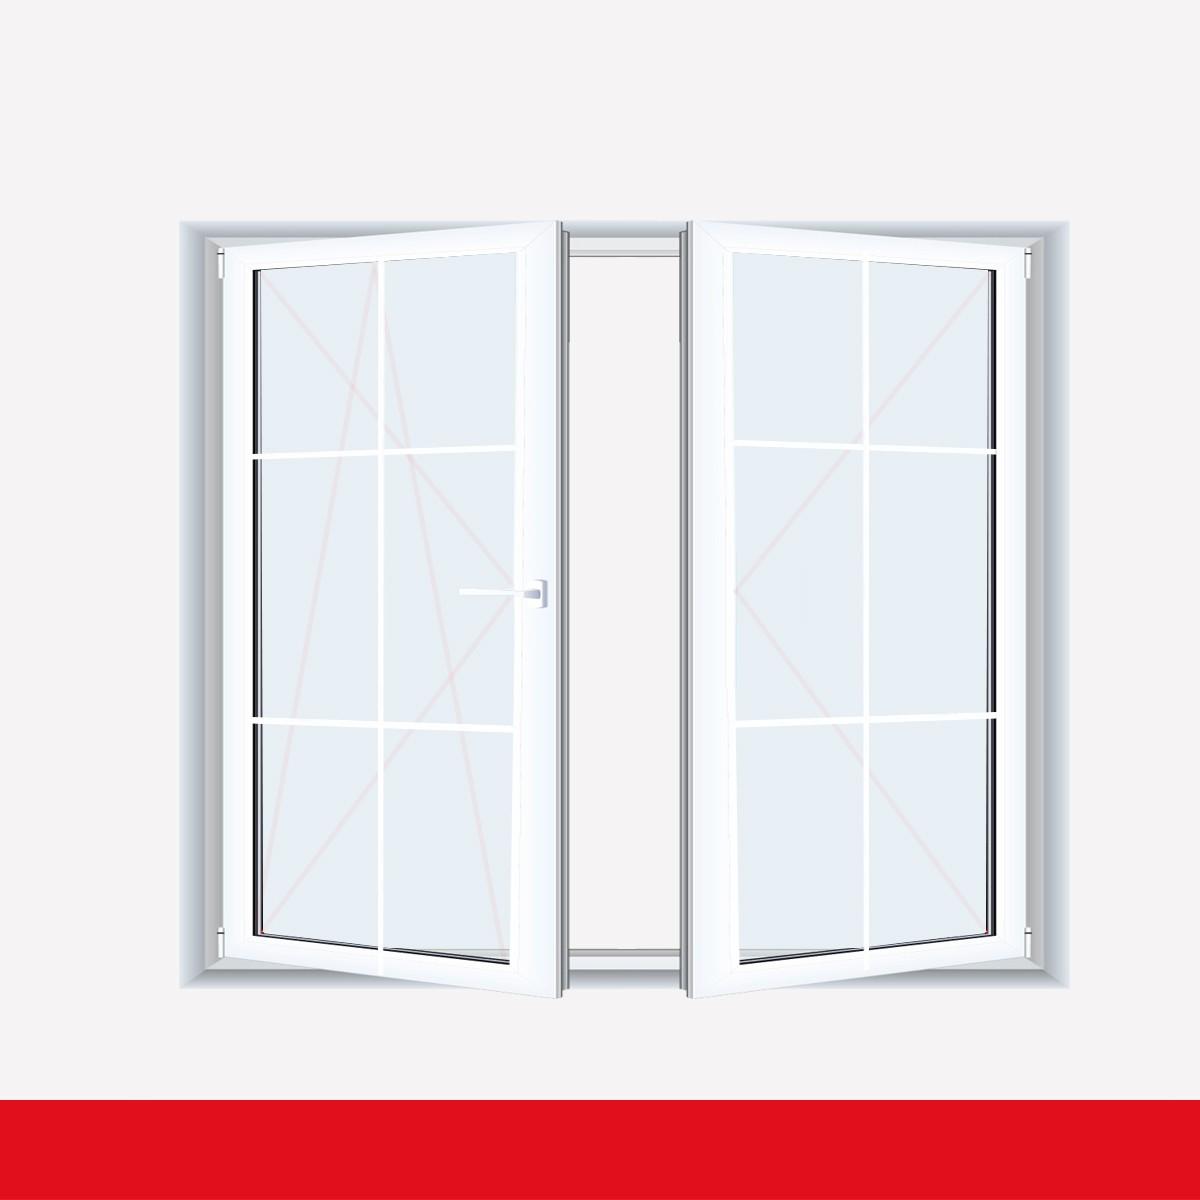 Full Size of Kunststoff Fenster Sprossenfenster Typ 6 Felder Wei 2 Flg Stulp Kunststofffenster Insektenschutzrollo Neue Kosten Kbe Herne Insektenschutz Folien Für Fenster Kunststoff Fenster